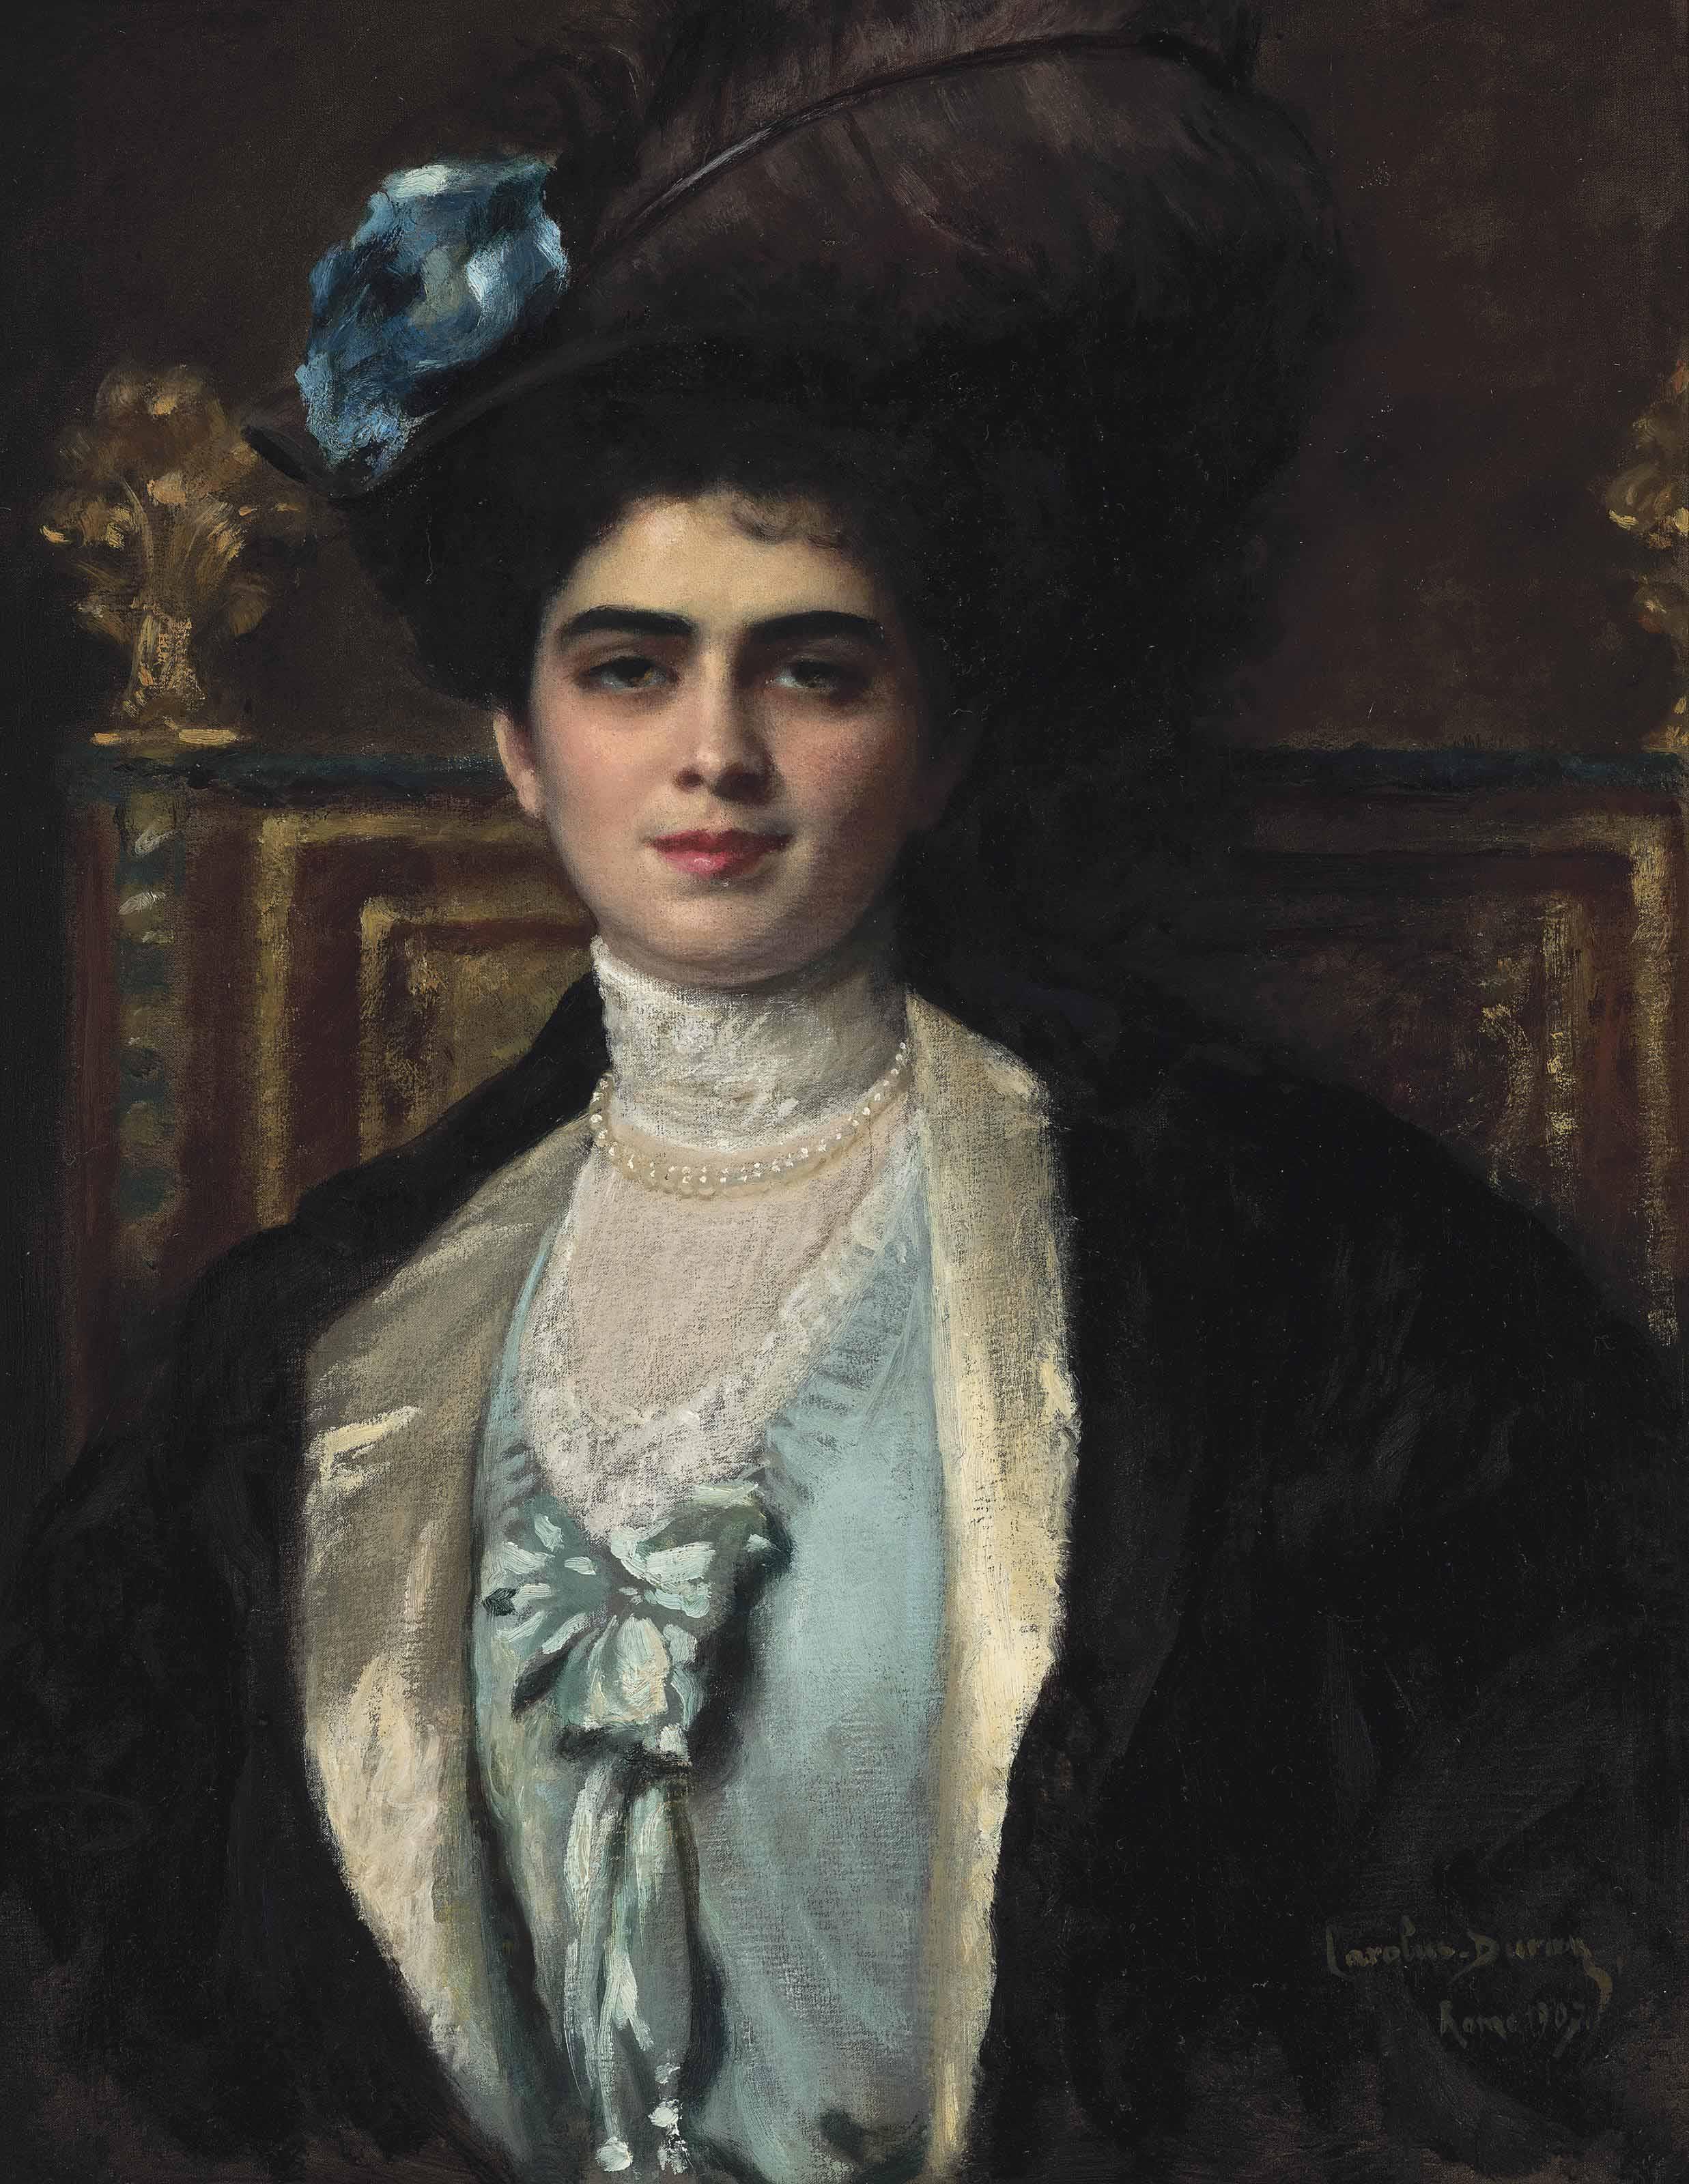 Charles-Emile-Auguste Carolus-Duran (French, 1838-1917)